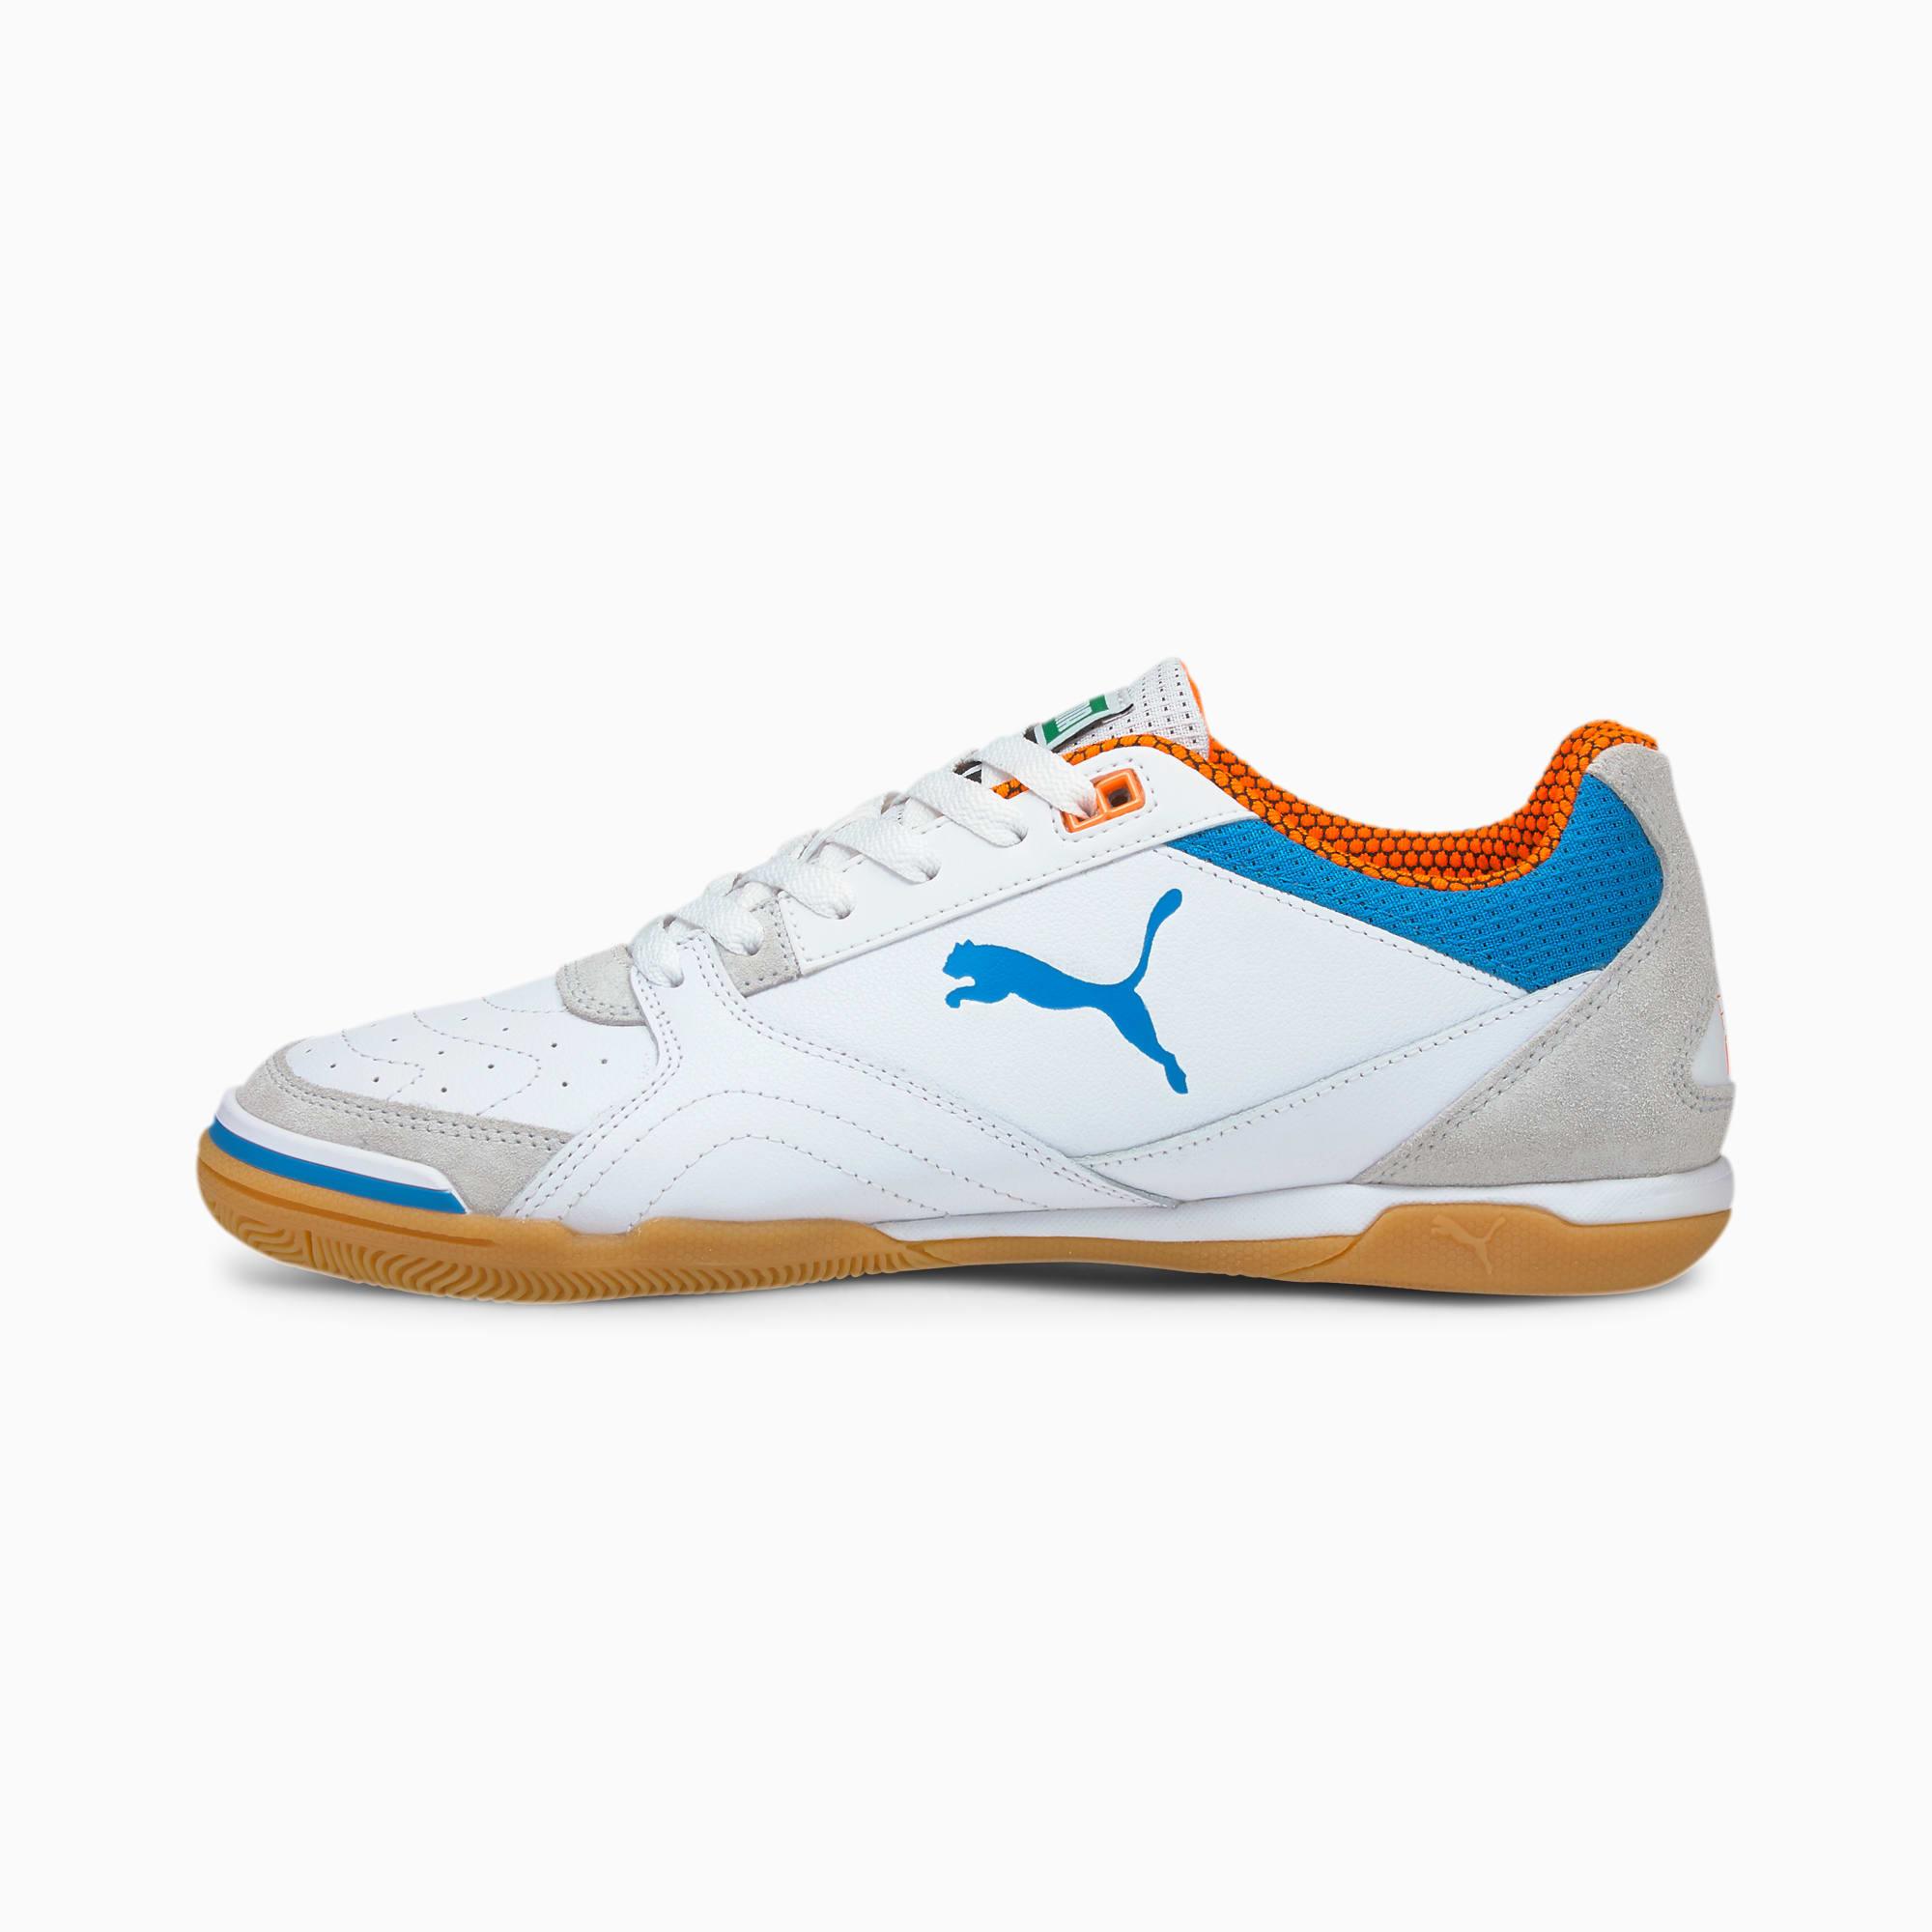 Chaussures de futsal Ibero